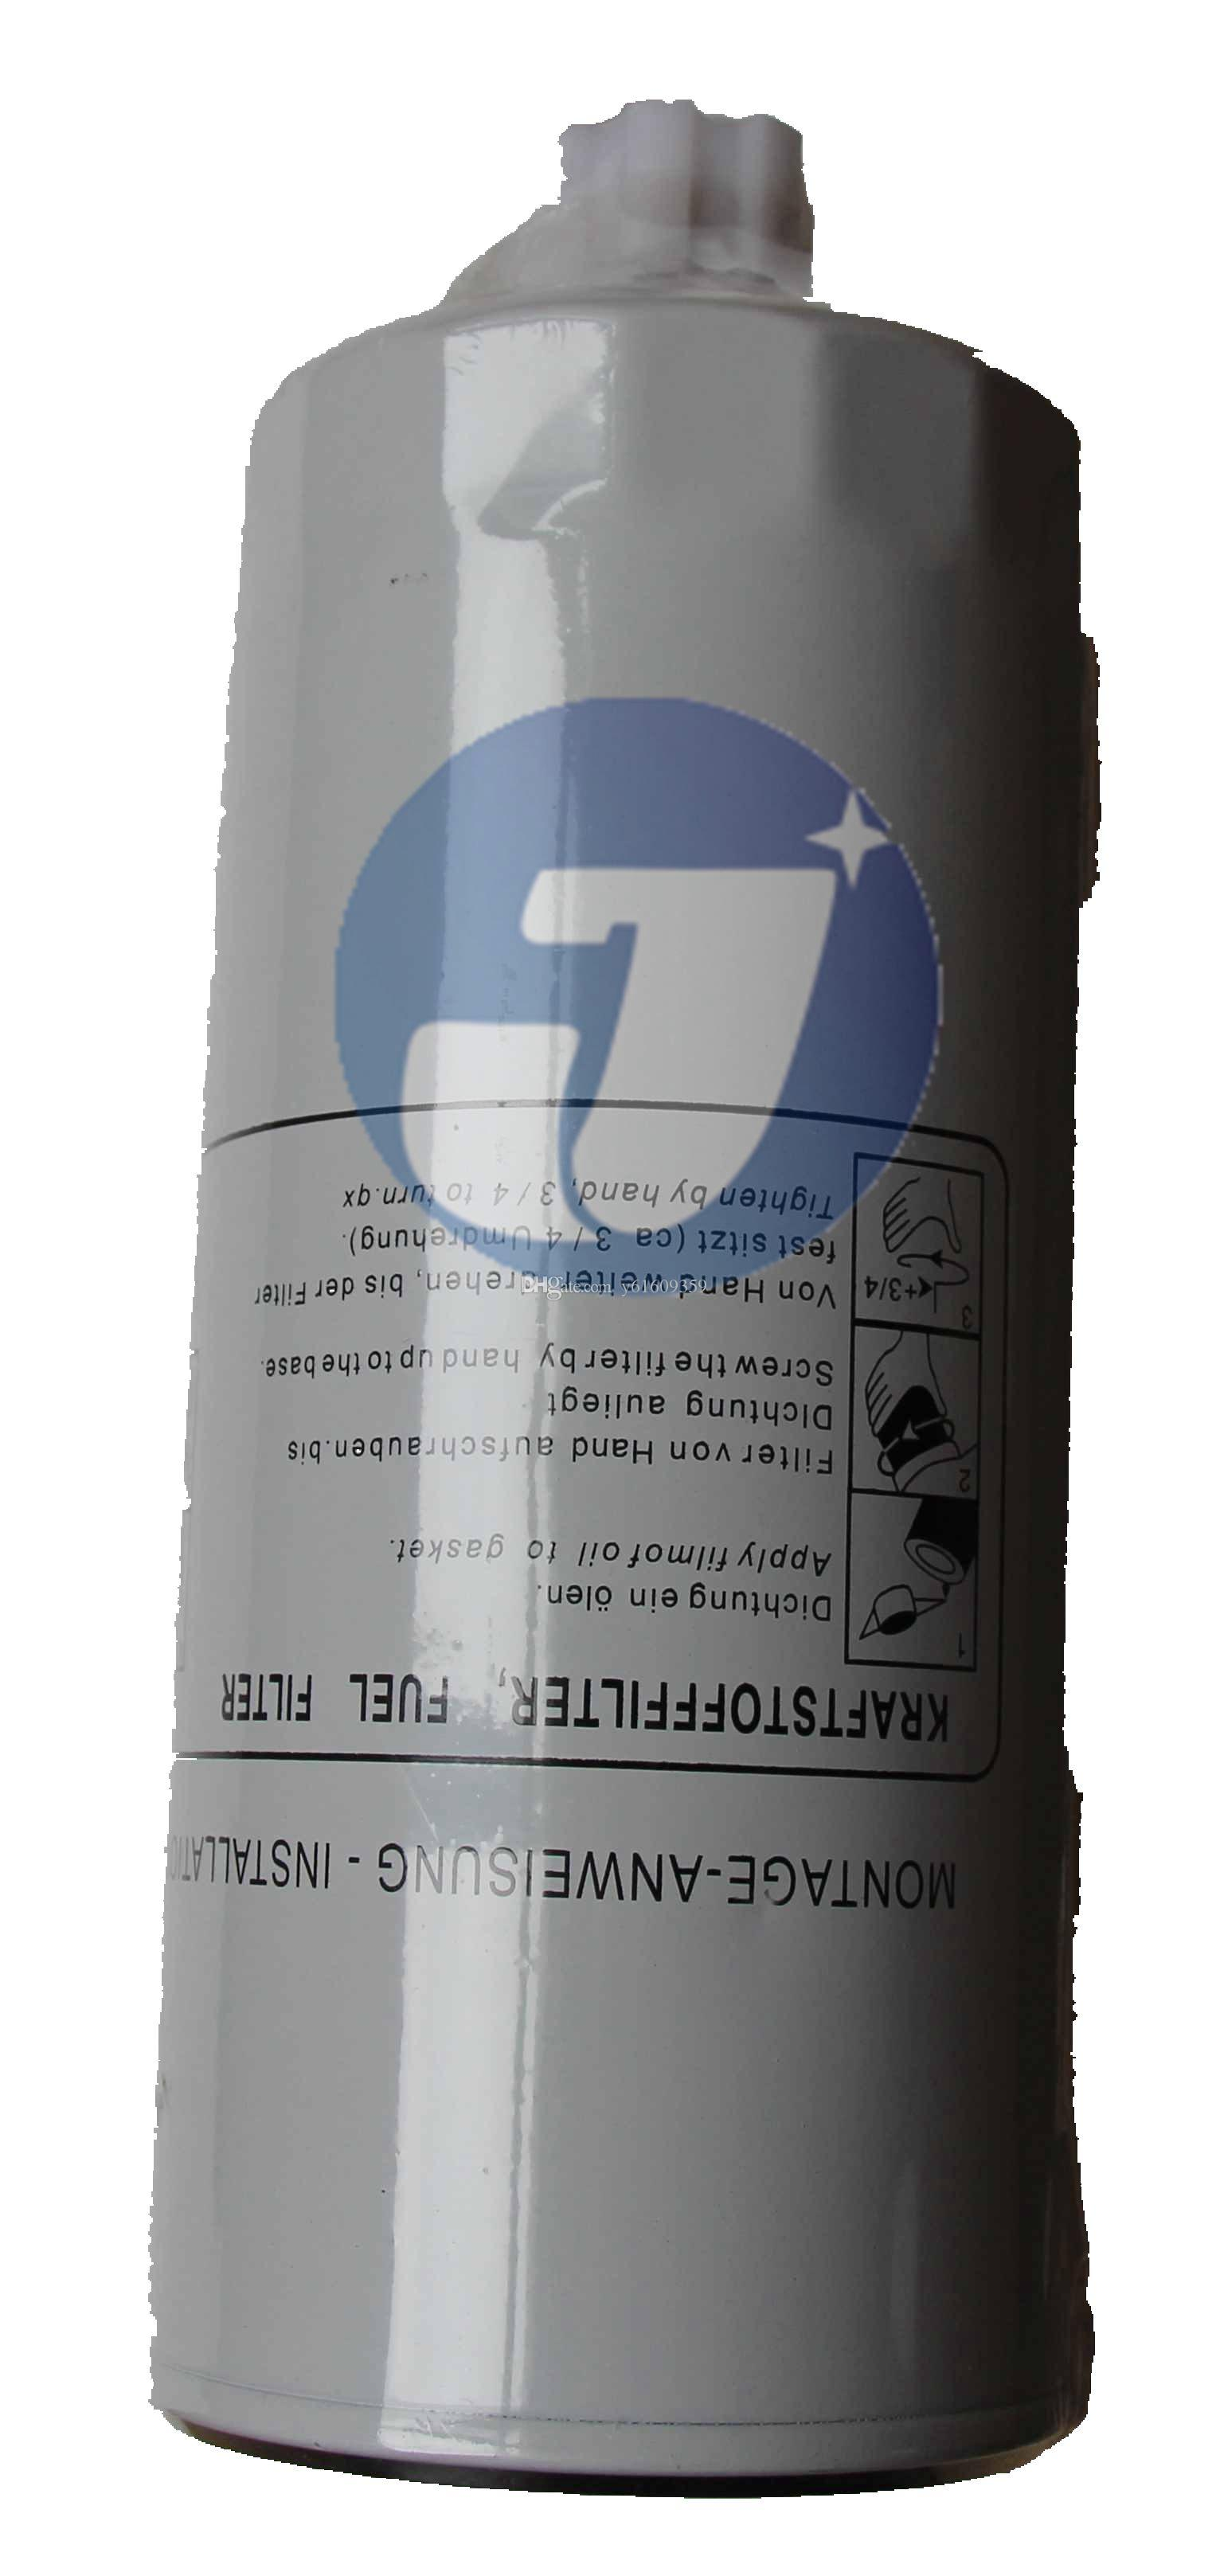 2018 0211 3831 Deutz 1013 Filter 02113831 From Y61609359 704 Fuel Filters